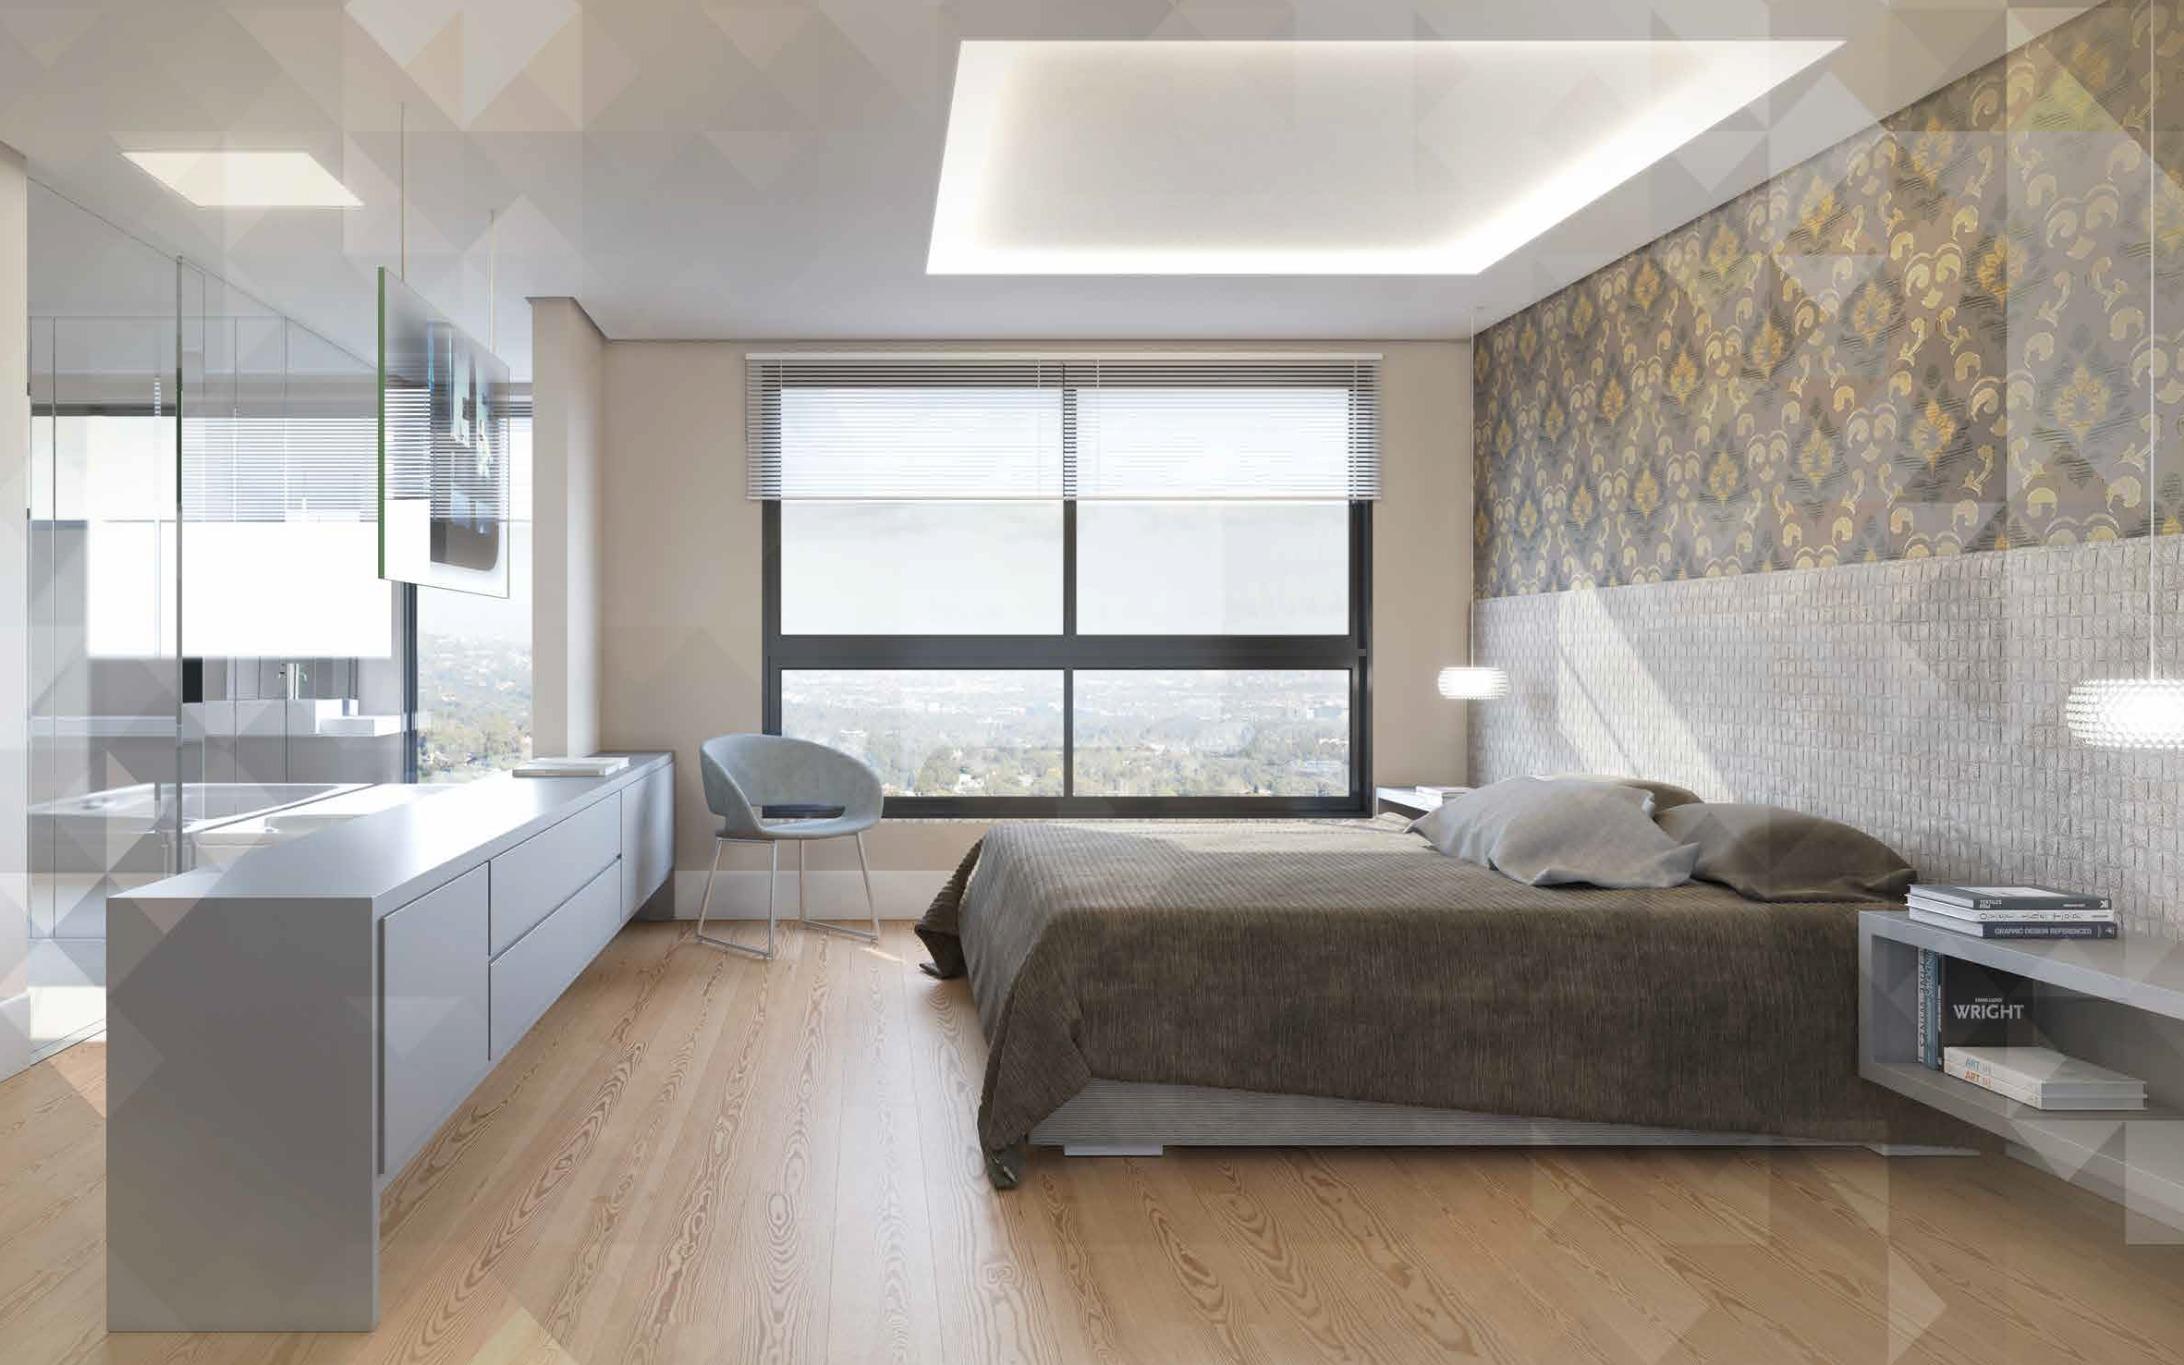 Royal de 3 dormitórios em Mont Serrat, Porto Alegre - RS